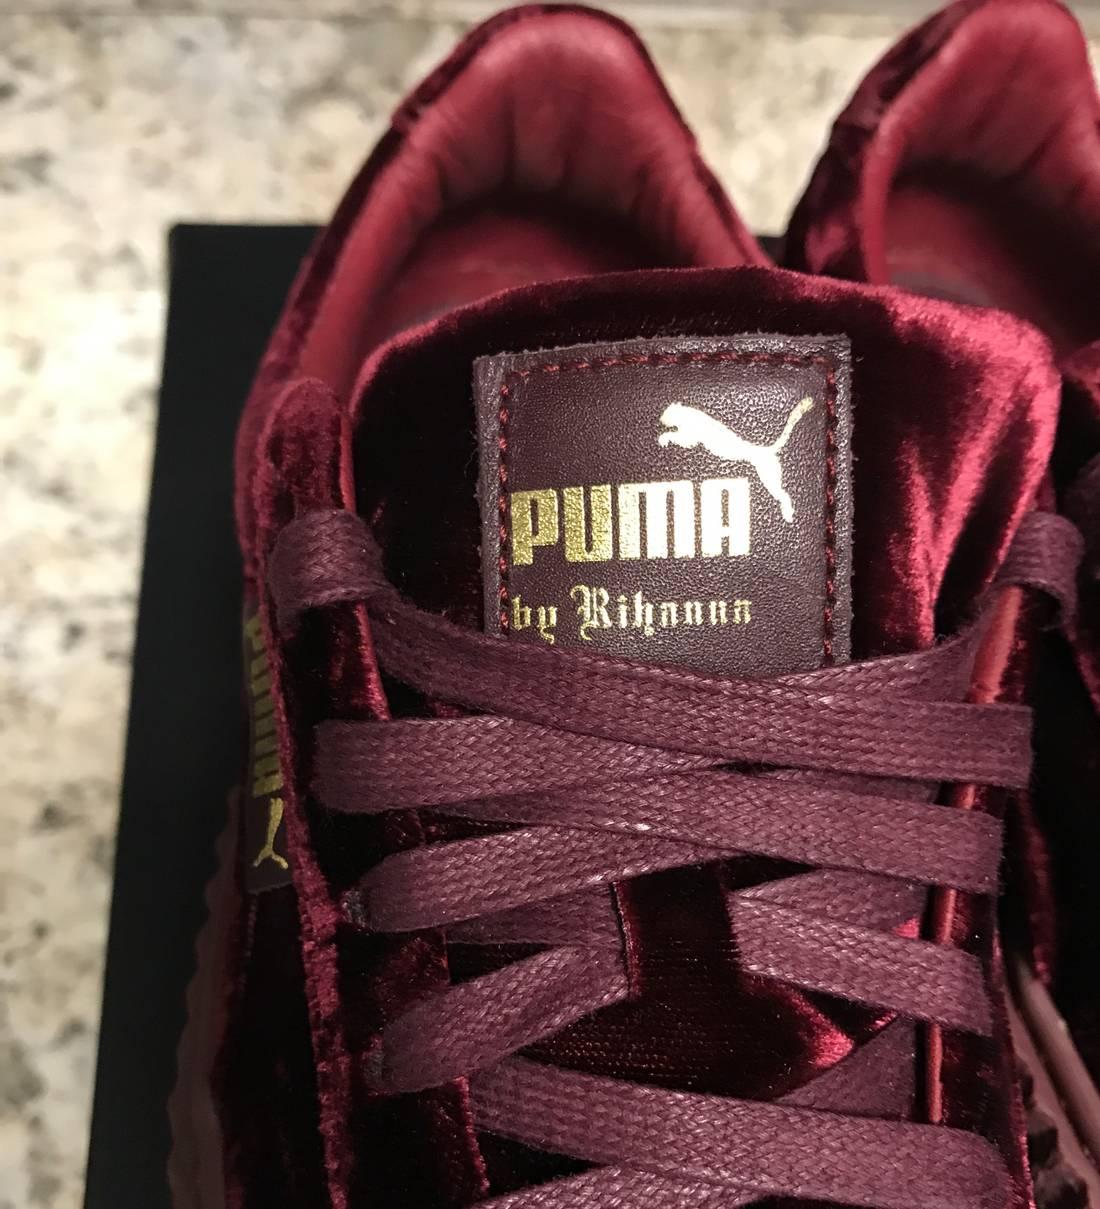 Puma X Rihanna Fenty Creepers Size 6 Low Top Maroon Us Eu 39 1